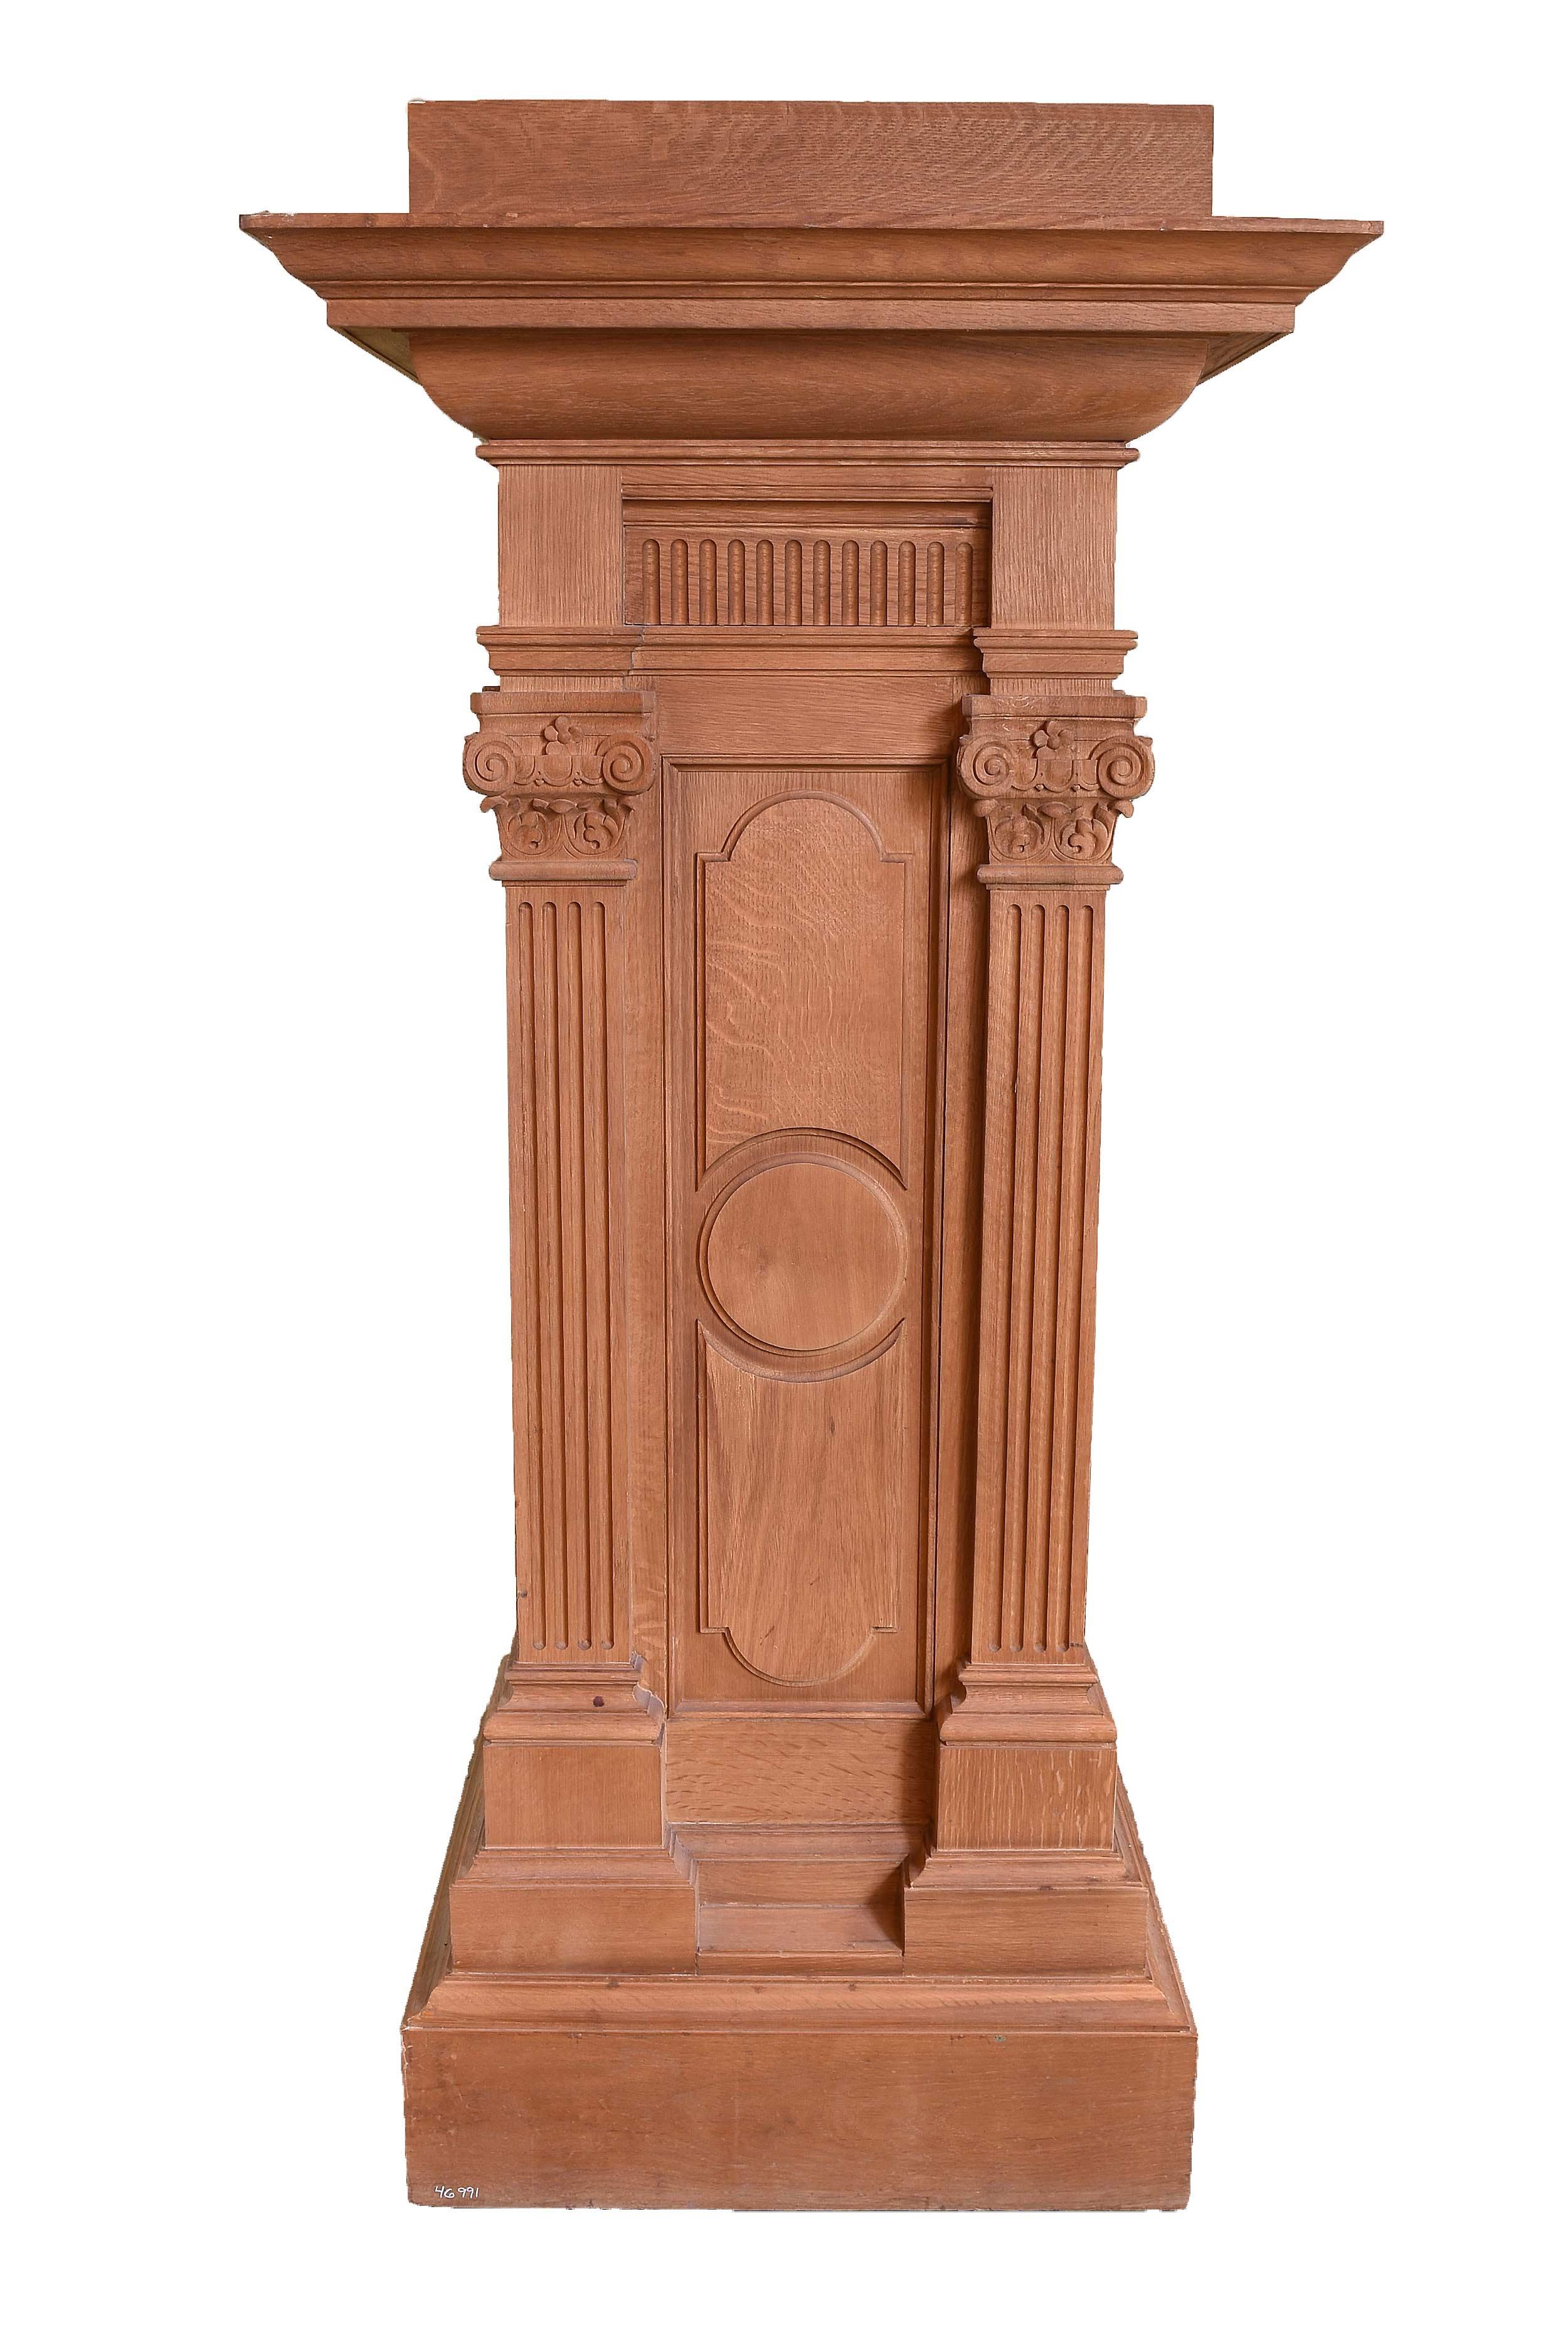 46991 quartersawn pedestal.jpg